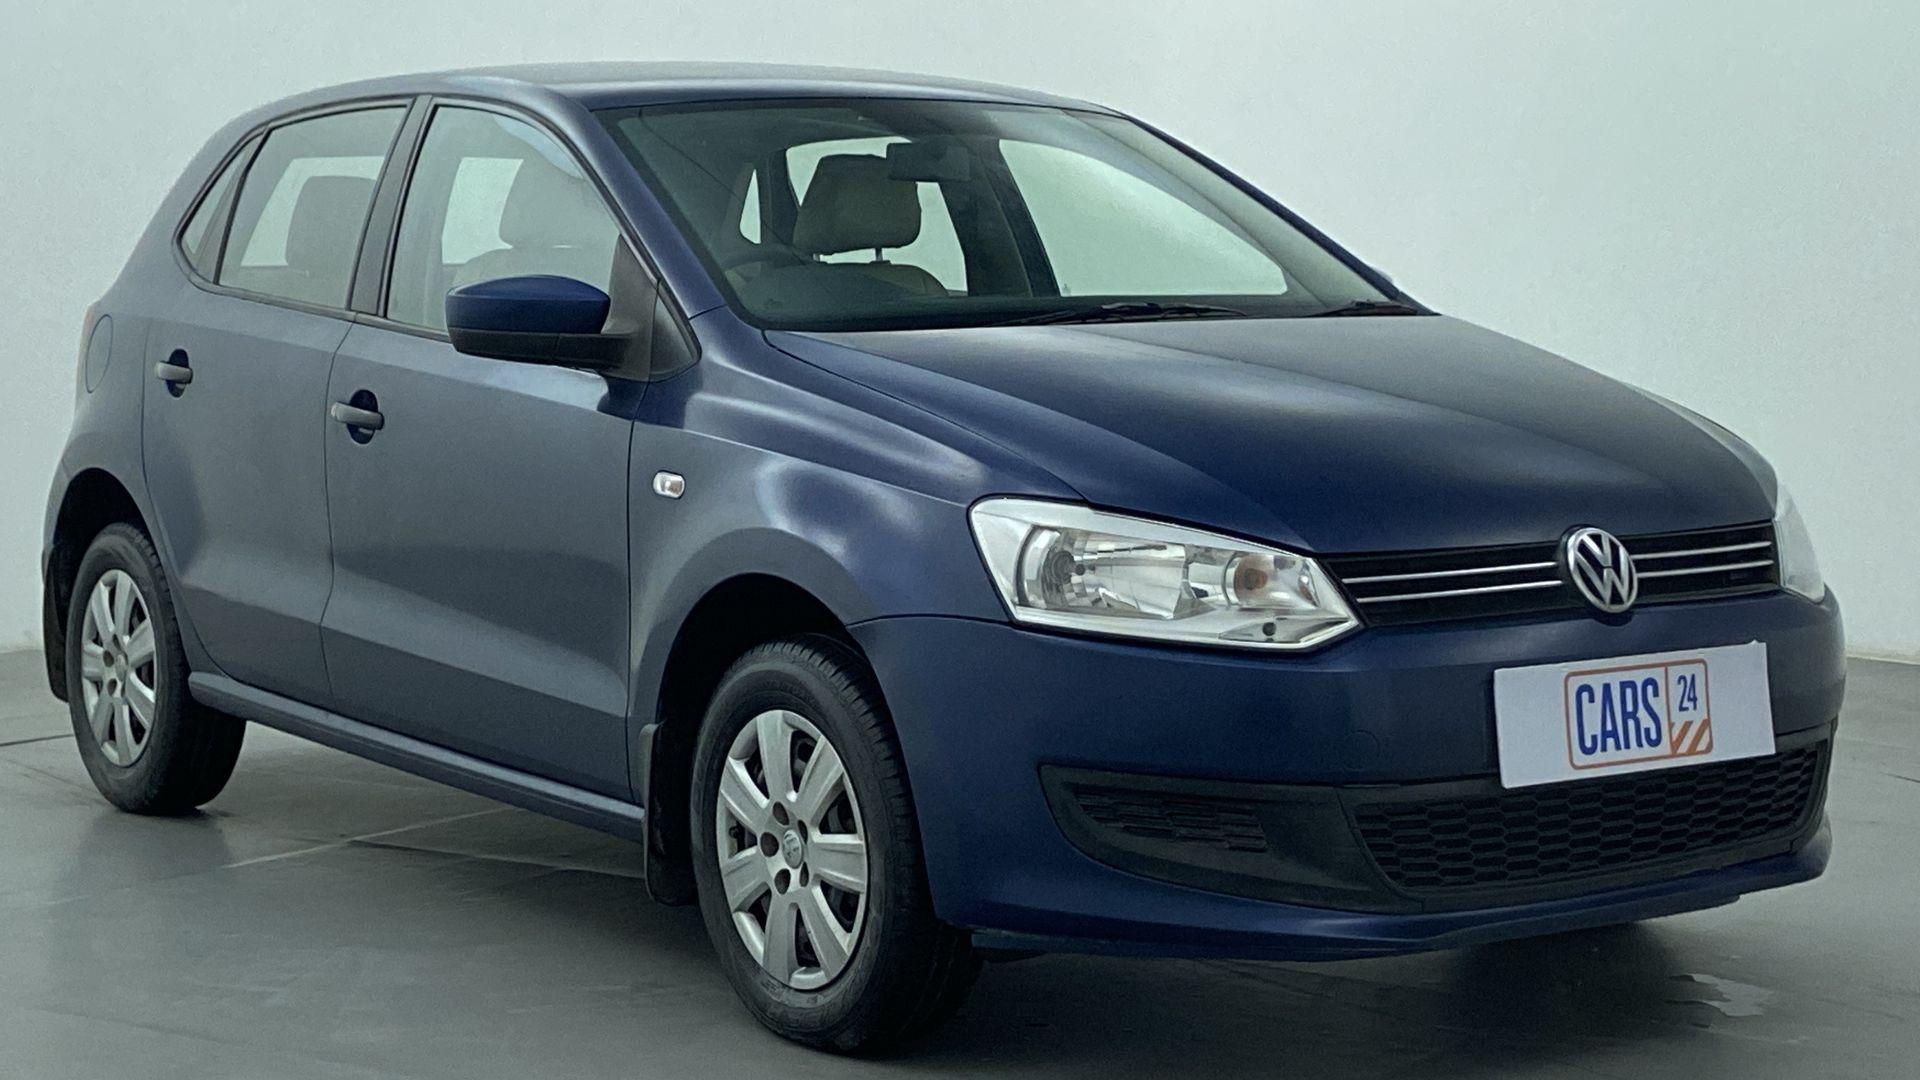 2013 Volkswagen Polo TRENDLINE 1.2L PETROL